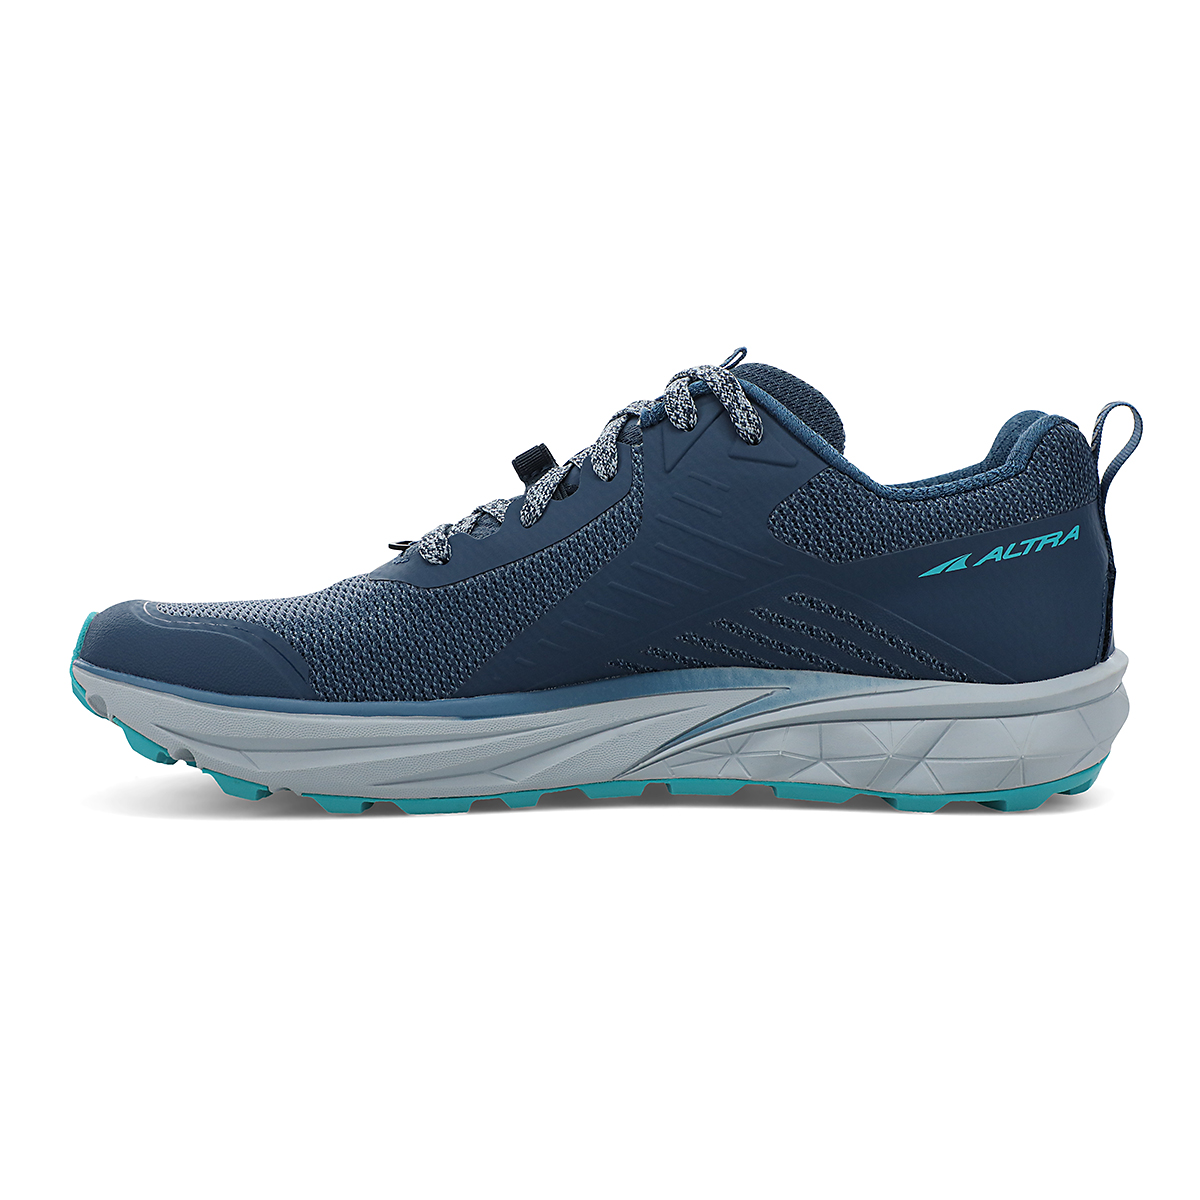 Women's Altra Timp 3 Trail Running Shoe - Color: Dark Blue - Size: 6 - Width: Regular, Dark Blue, large, image 2